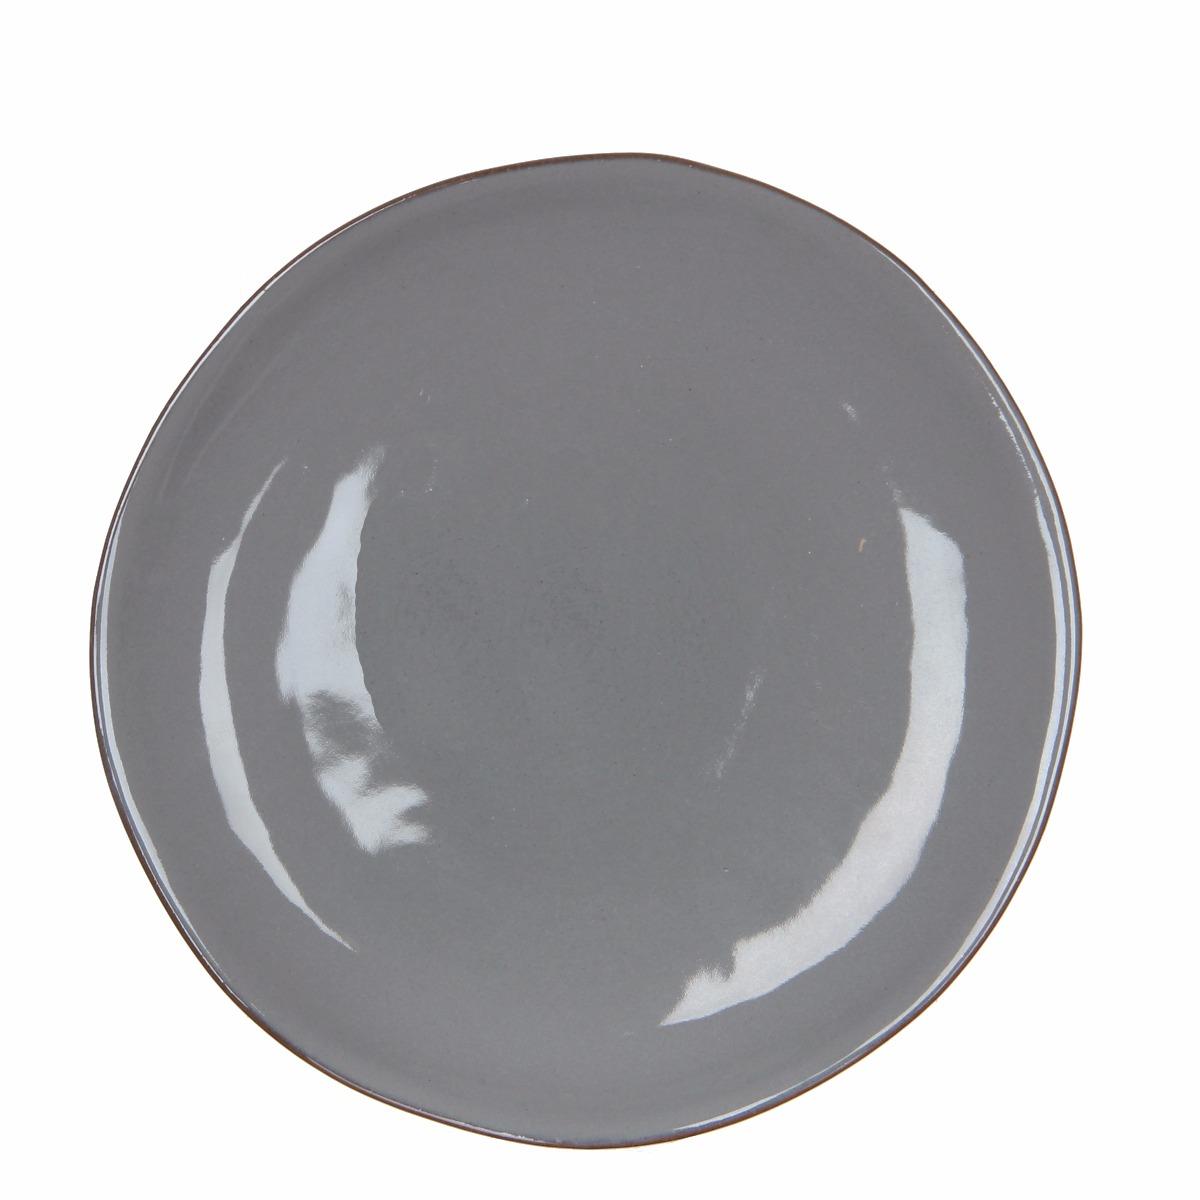 Afbeelding van Casa vivante bord ursula grijs h2xd29cm